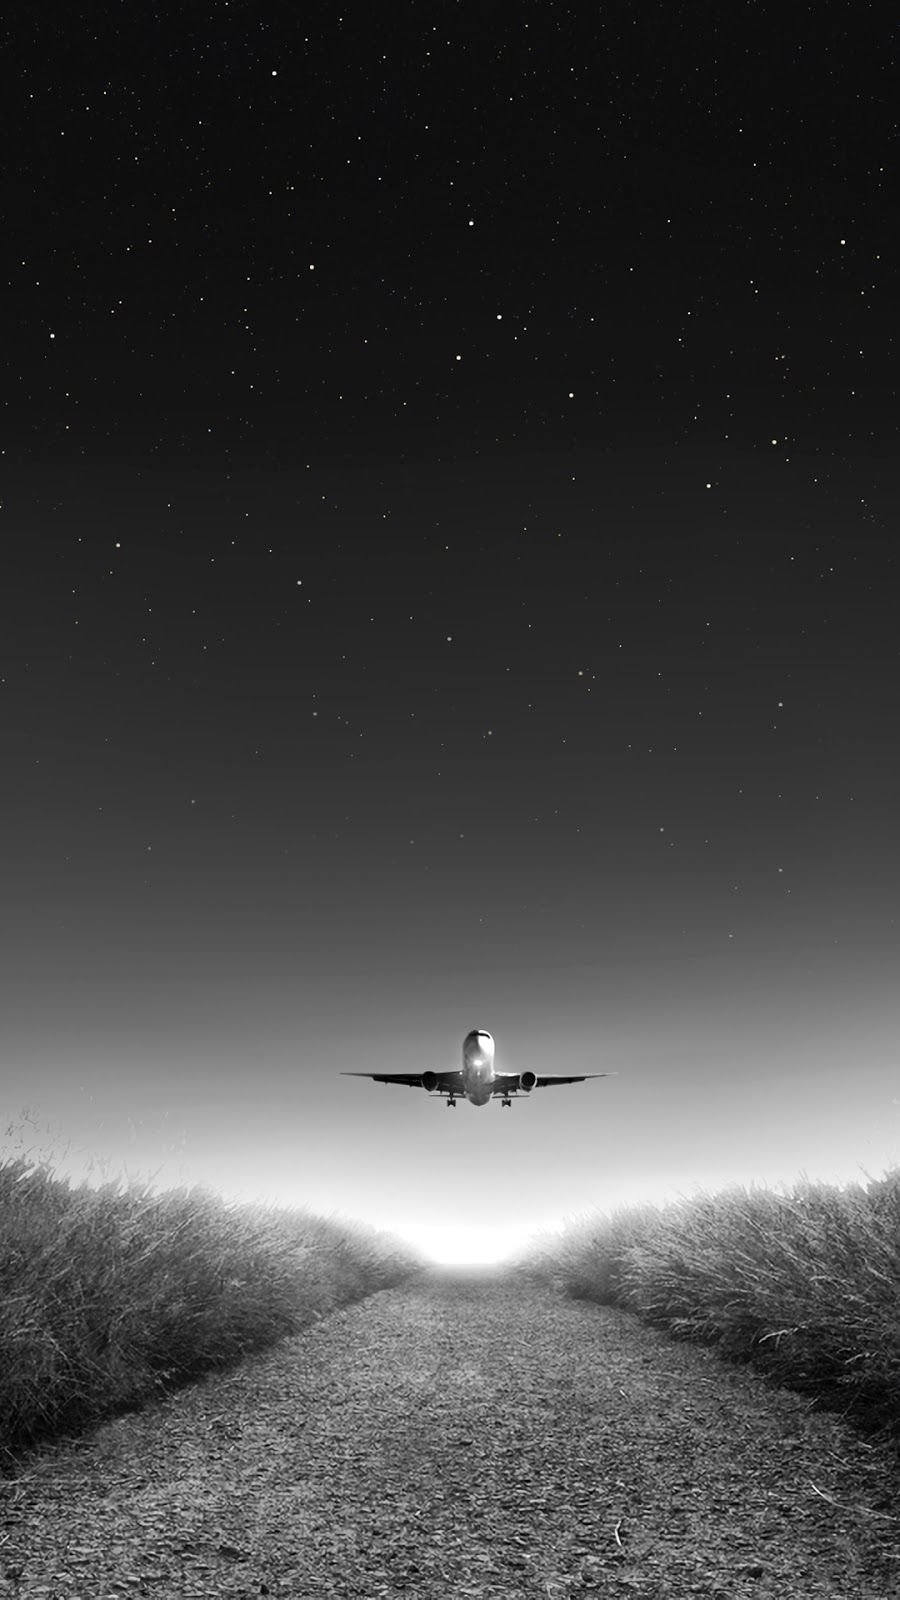 Starry Night Airplane Wallpaper Wallpaper Plane Wallpaper